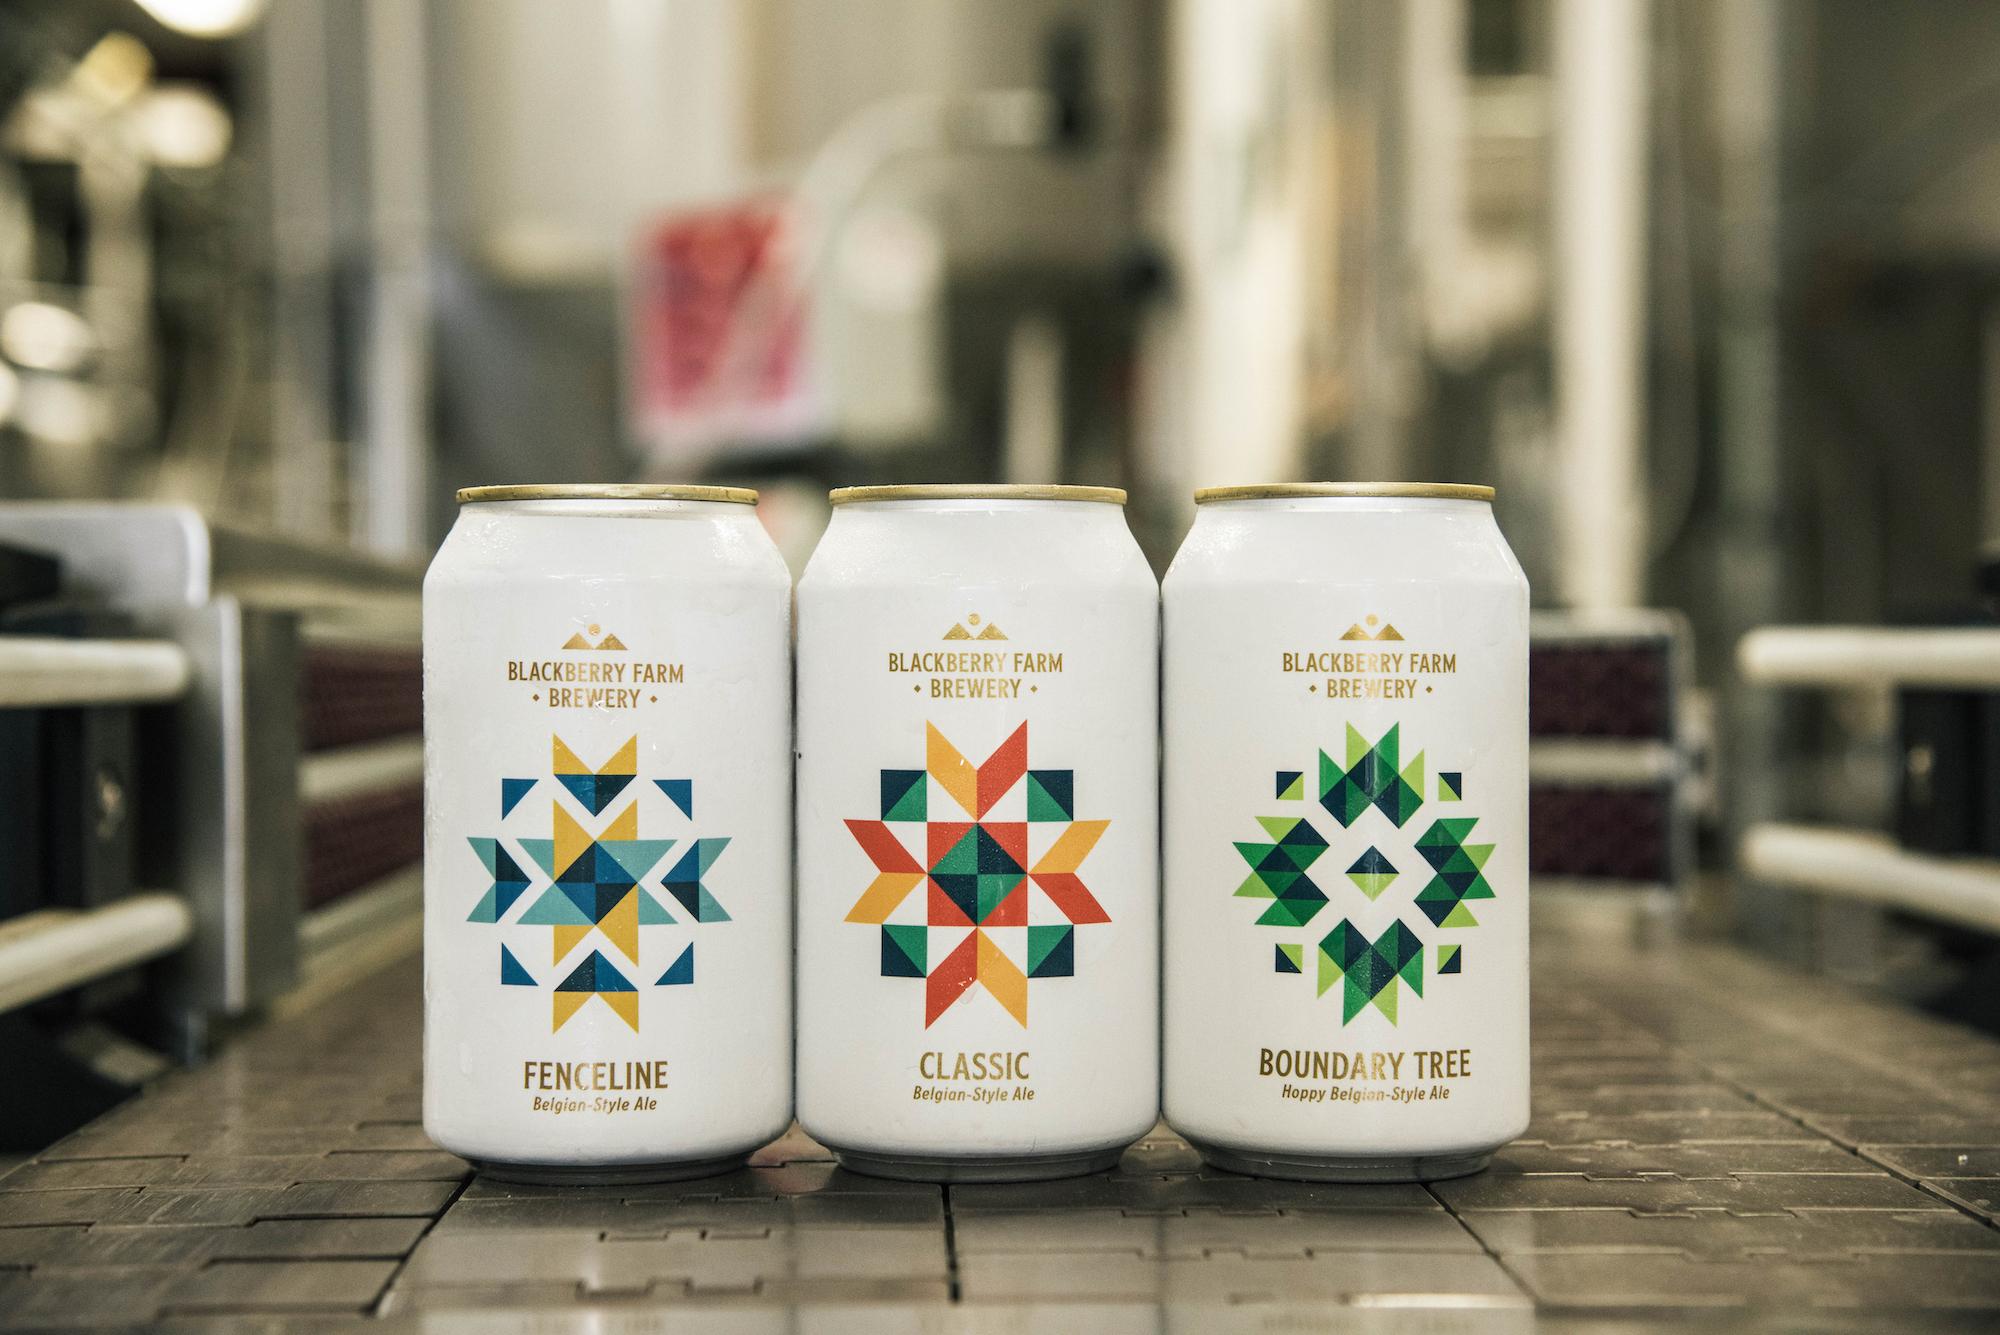 Blackberry Farm Brewery - Humphrey Munson